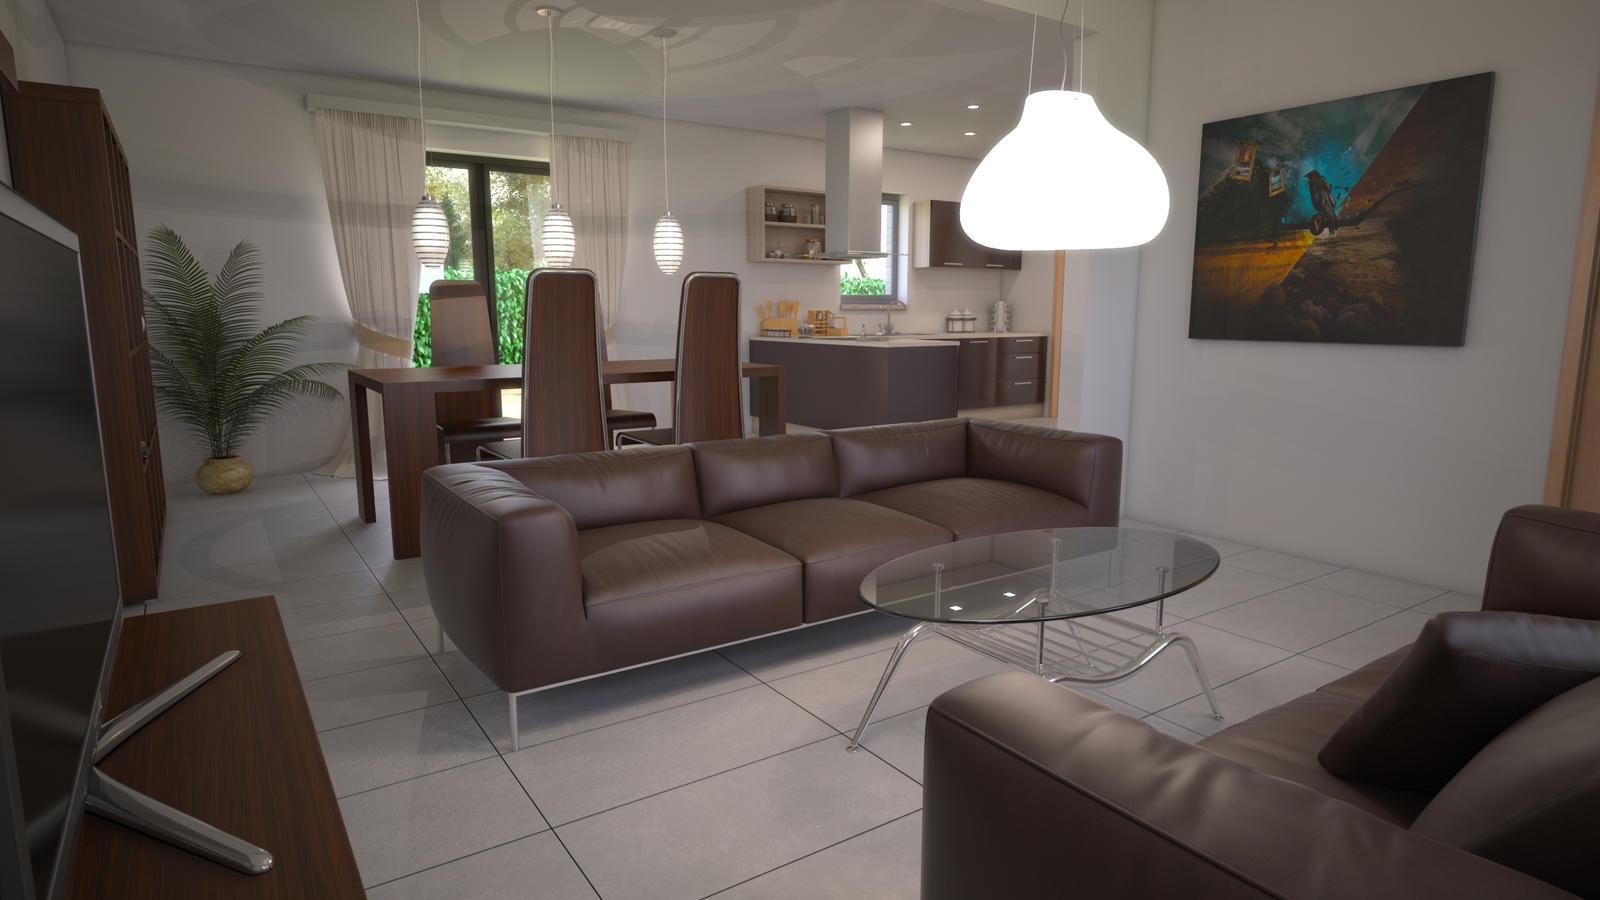 Eco4 Livingroom by bobi-z